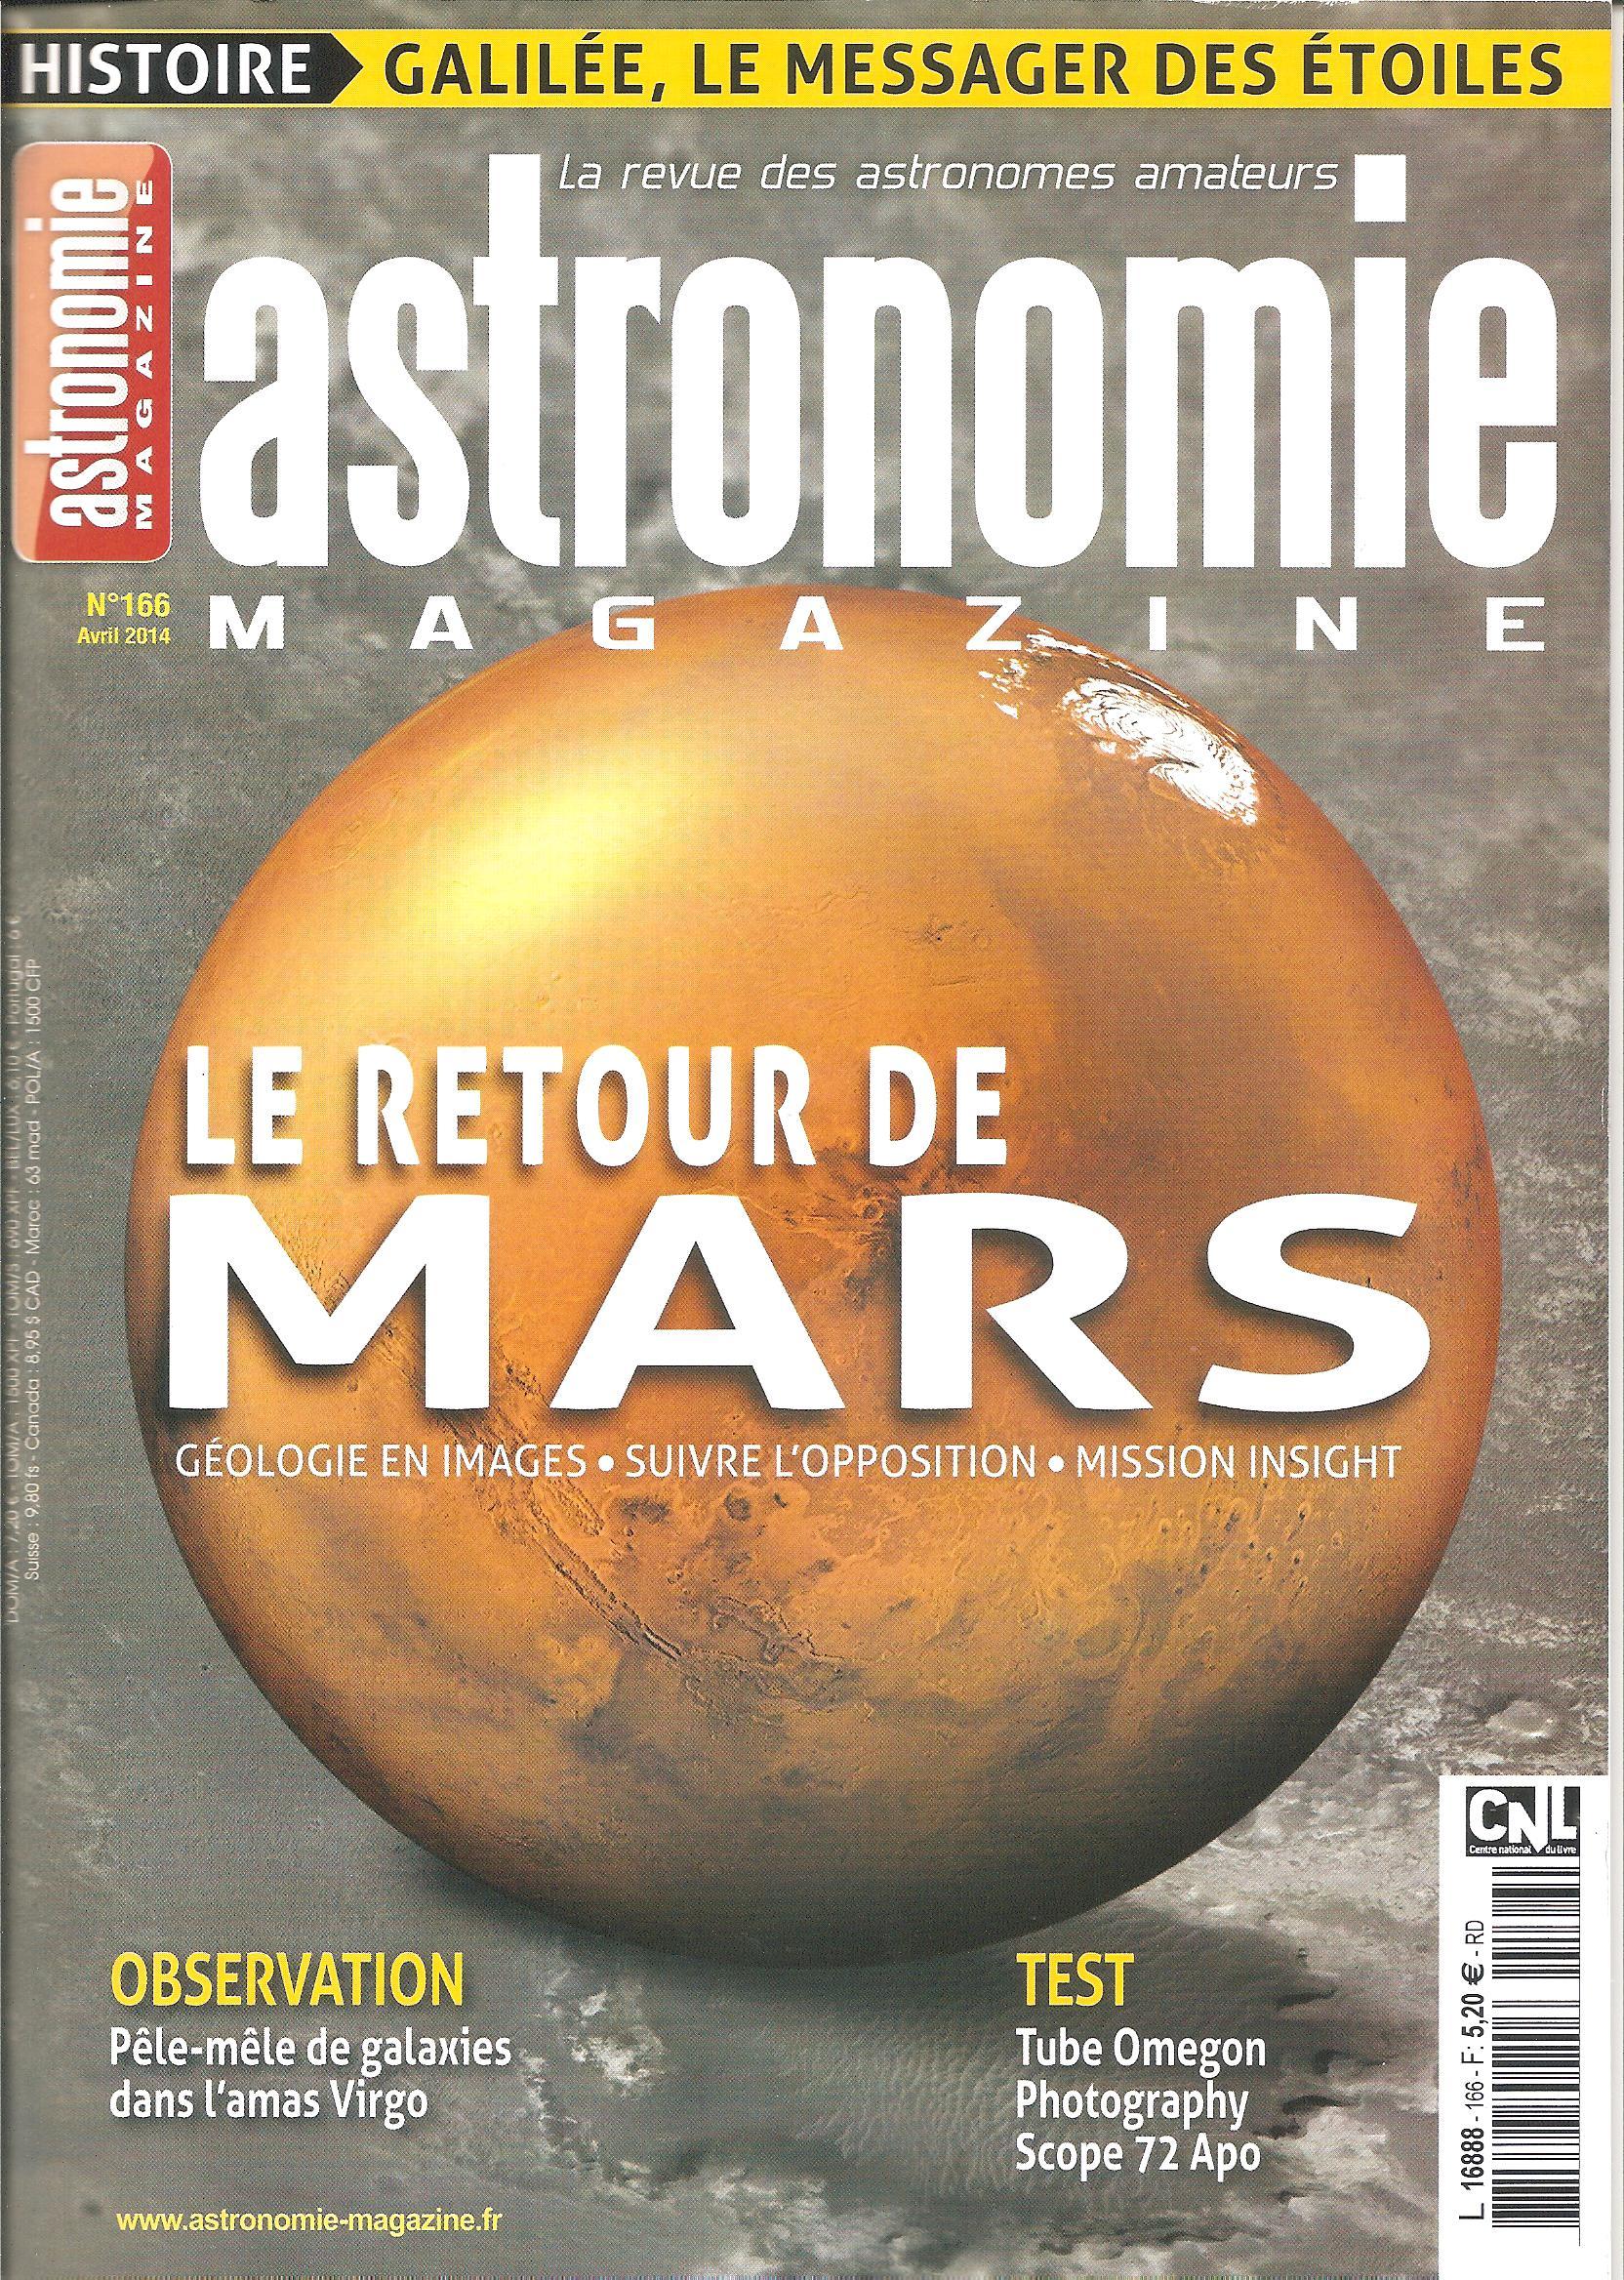 astronomiemagazine16pagesmartiennesavril2014